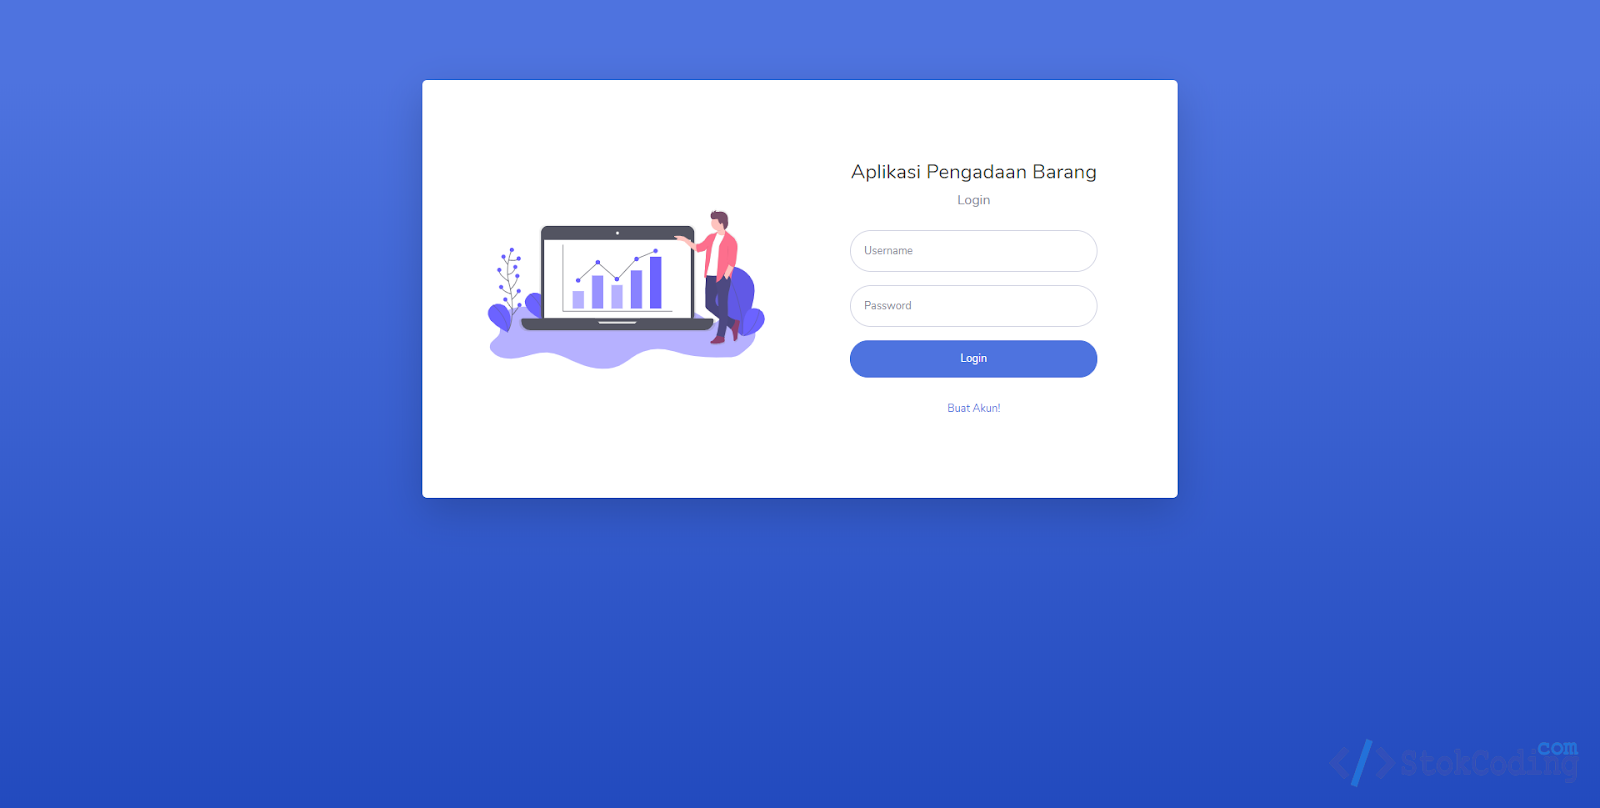 Aplikasi Pengadaan Barang Berbasis Web (Codeigniter)